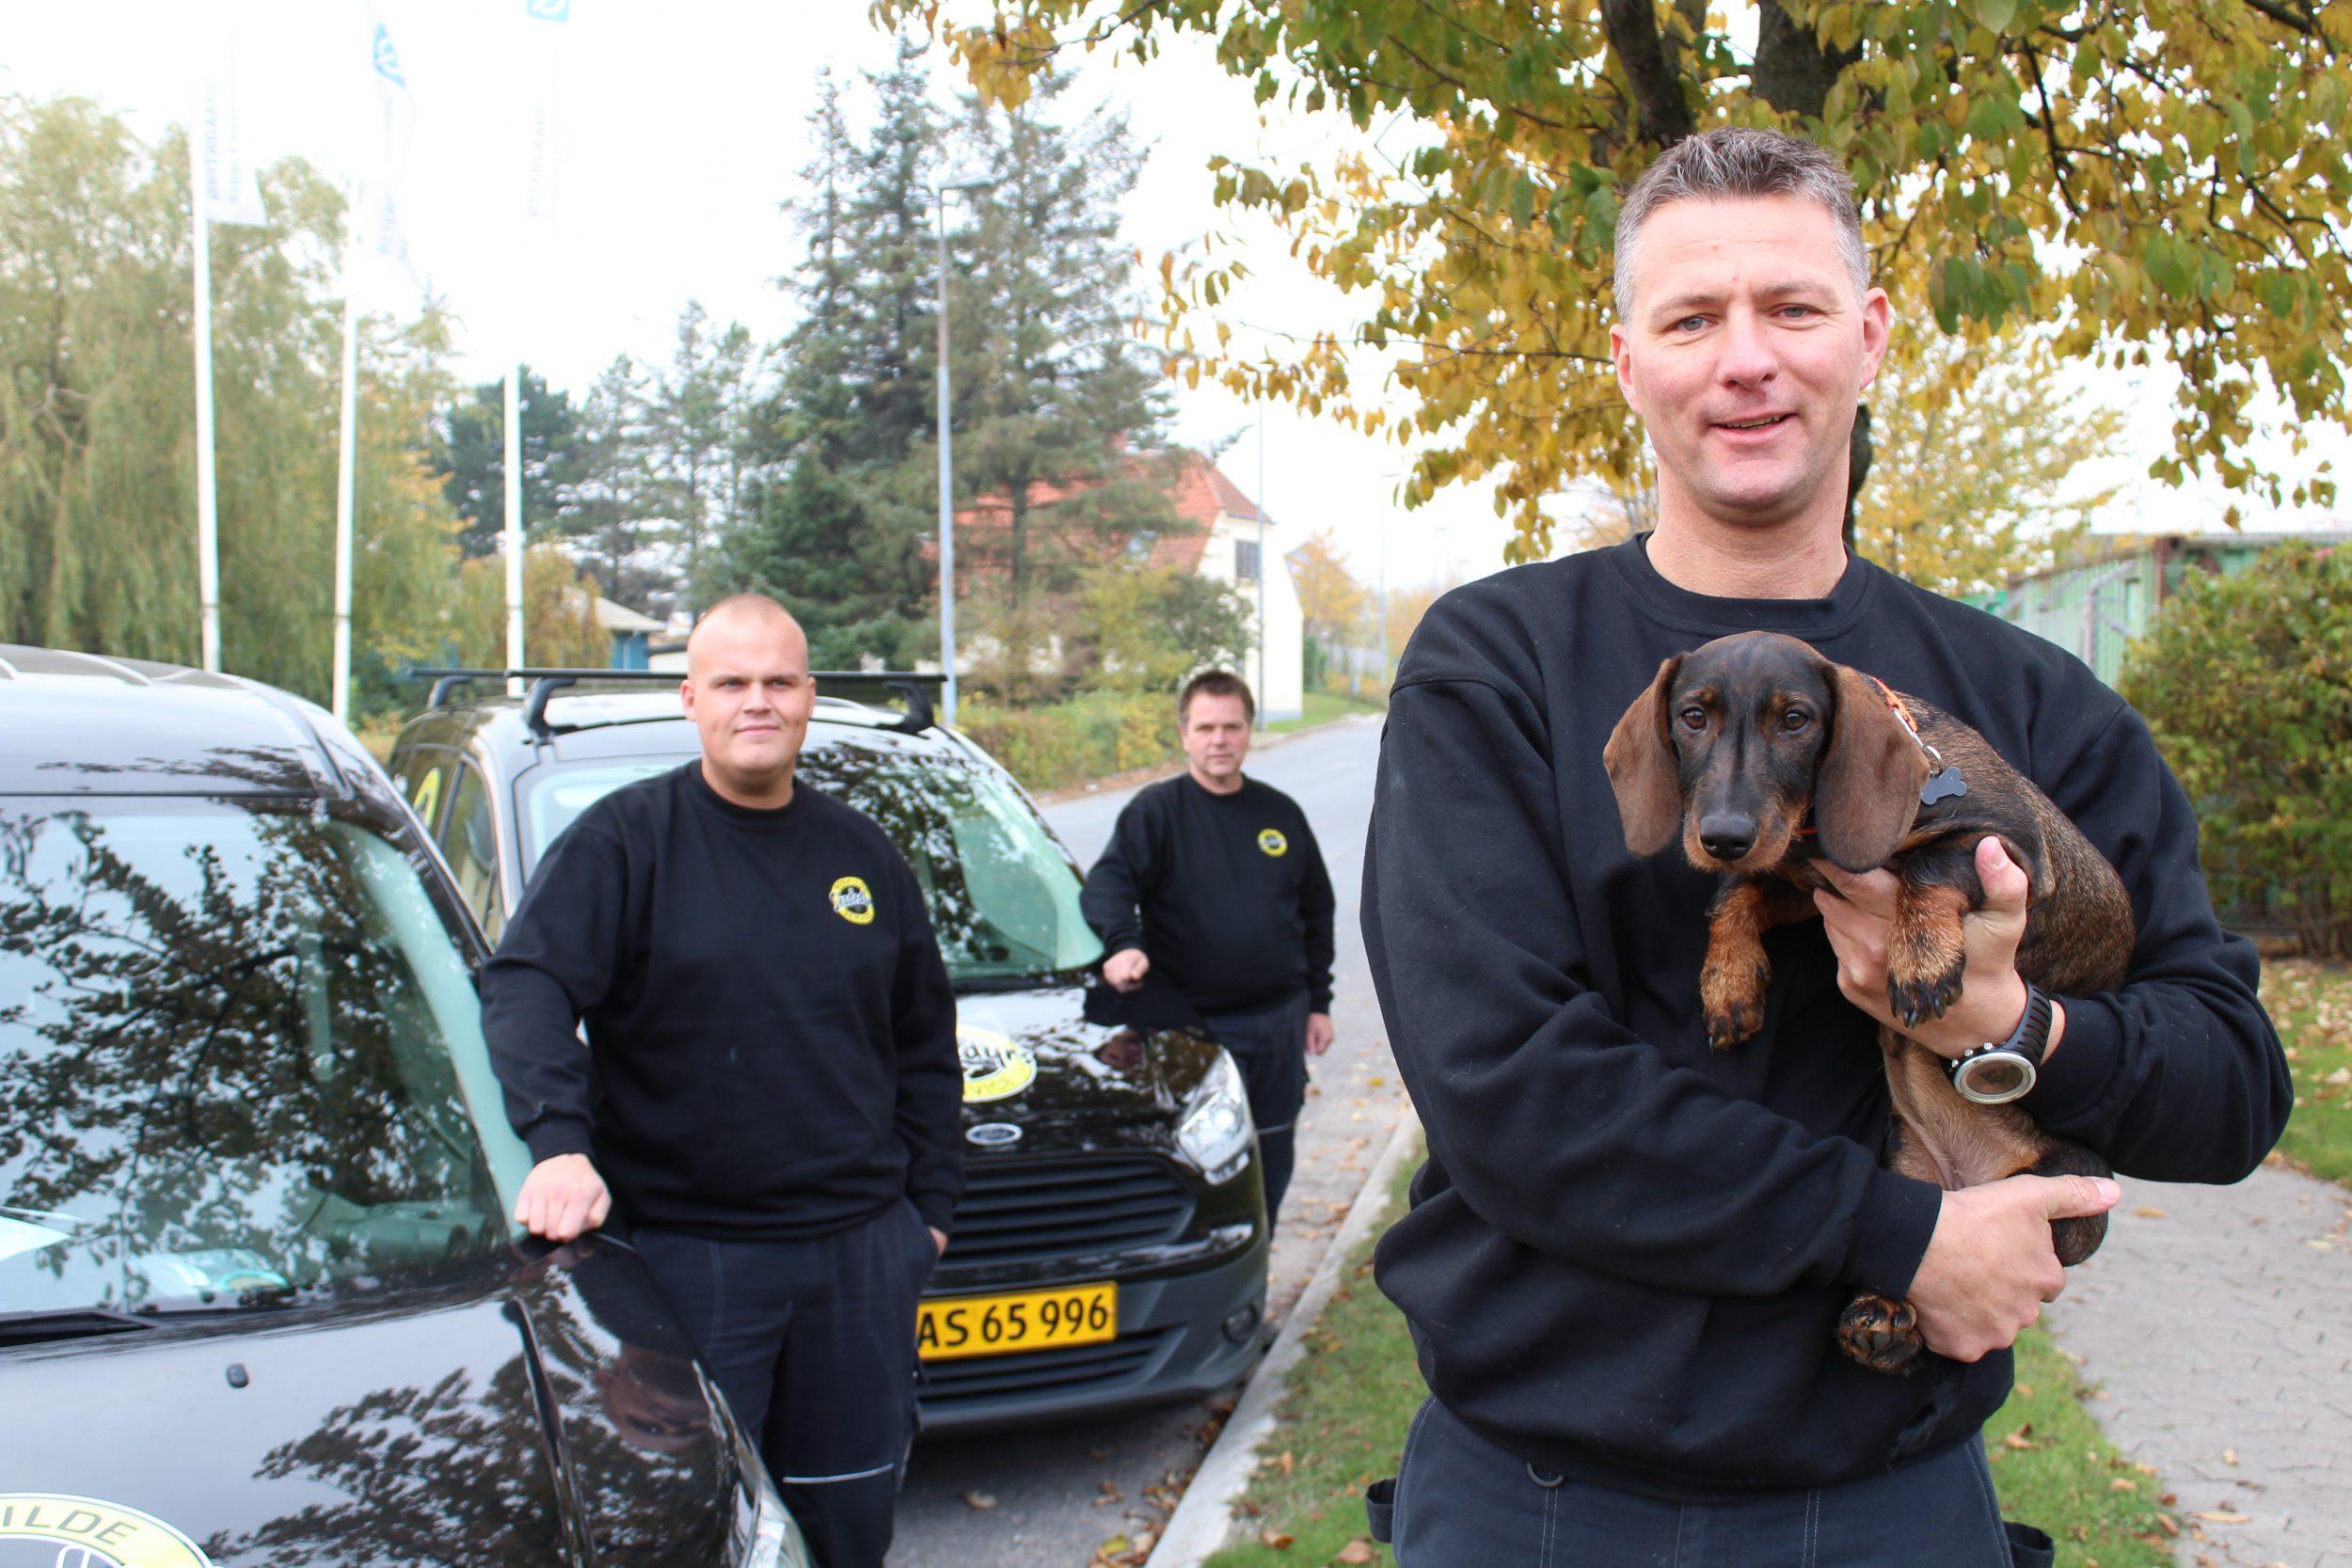 Skadedyrsbekæmper tilbage i Roskilde